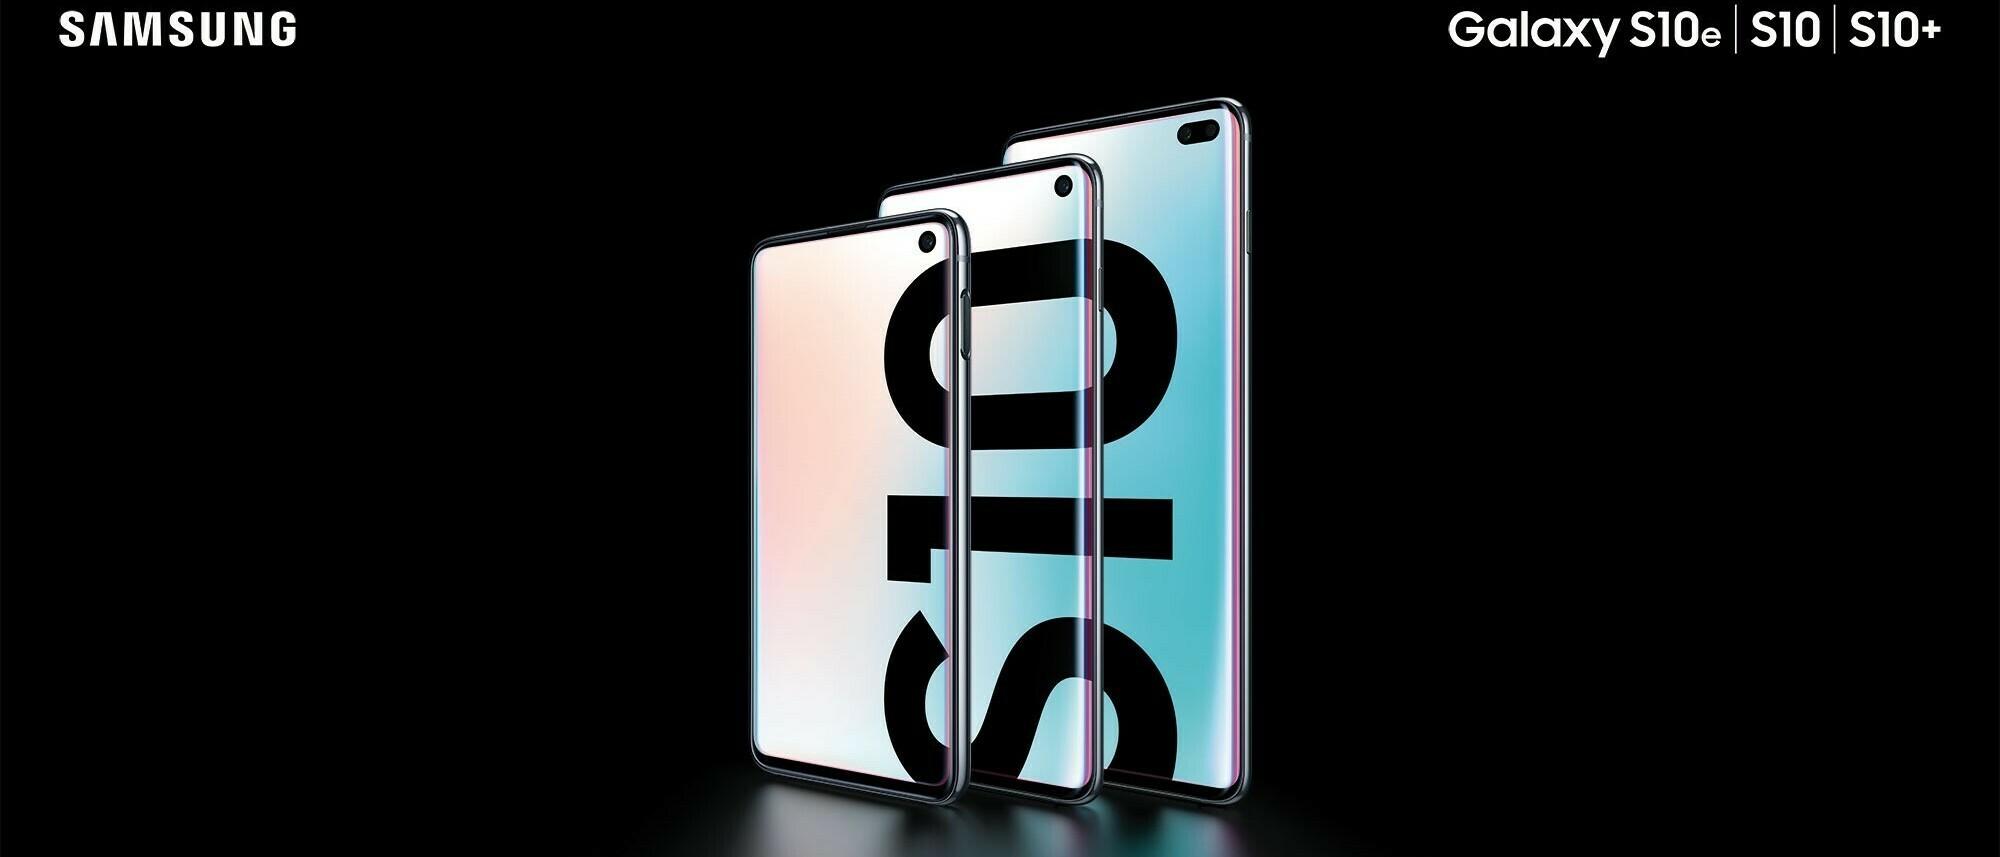 Le nouveau Samsung S10 sera-t-il disponible chez Koodo?